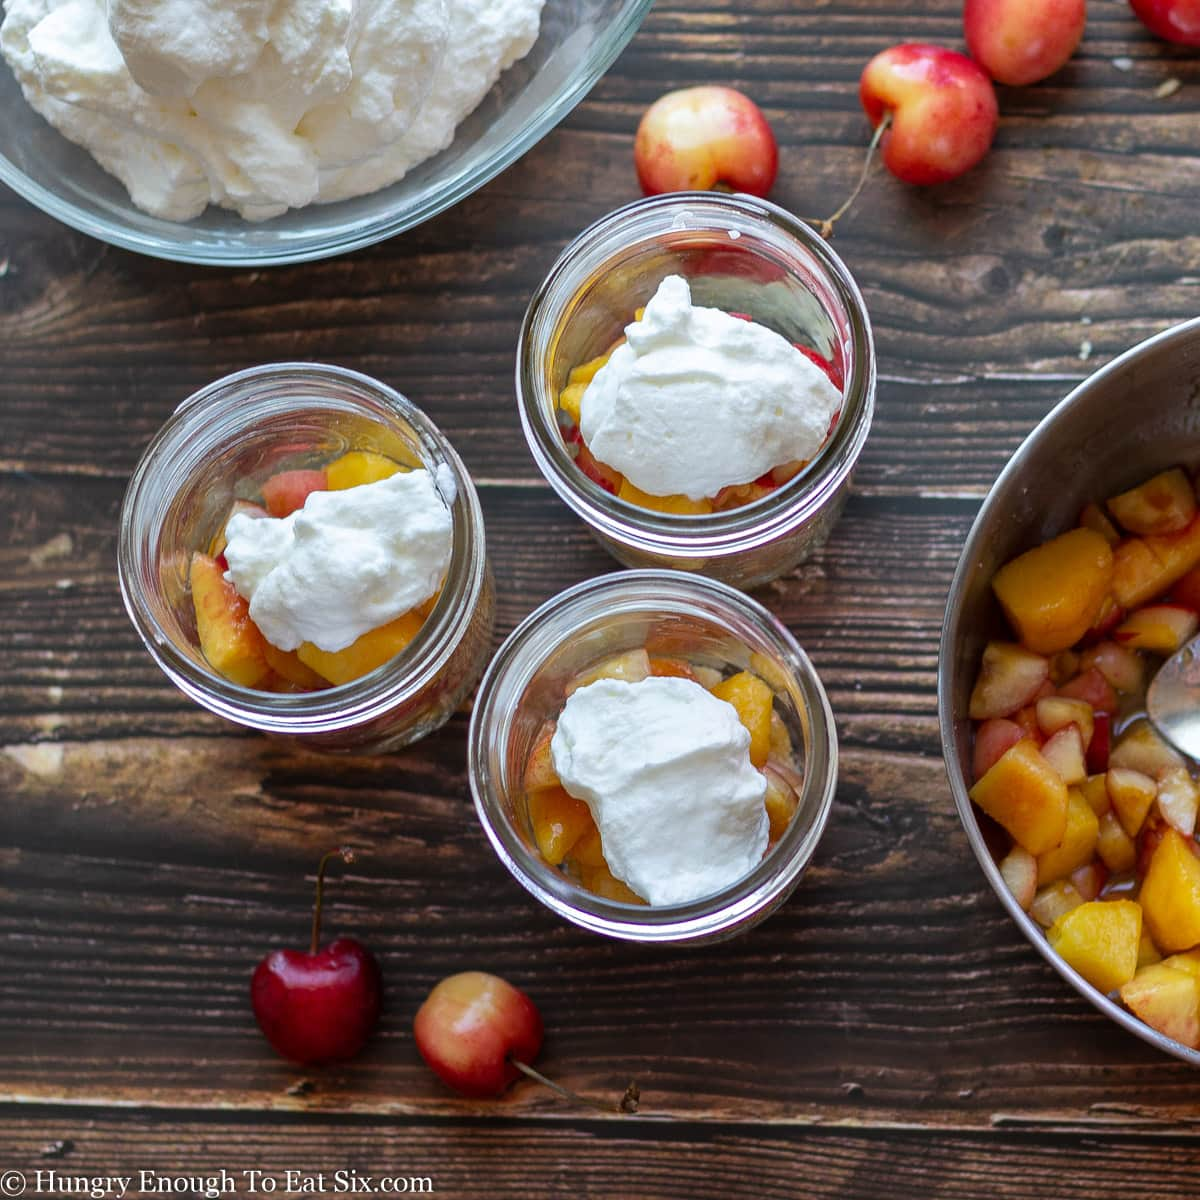 Mason jars with fruit and cream inside.